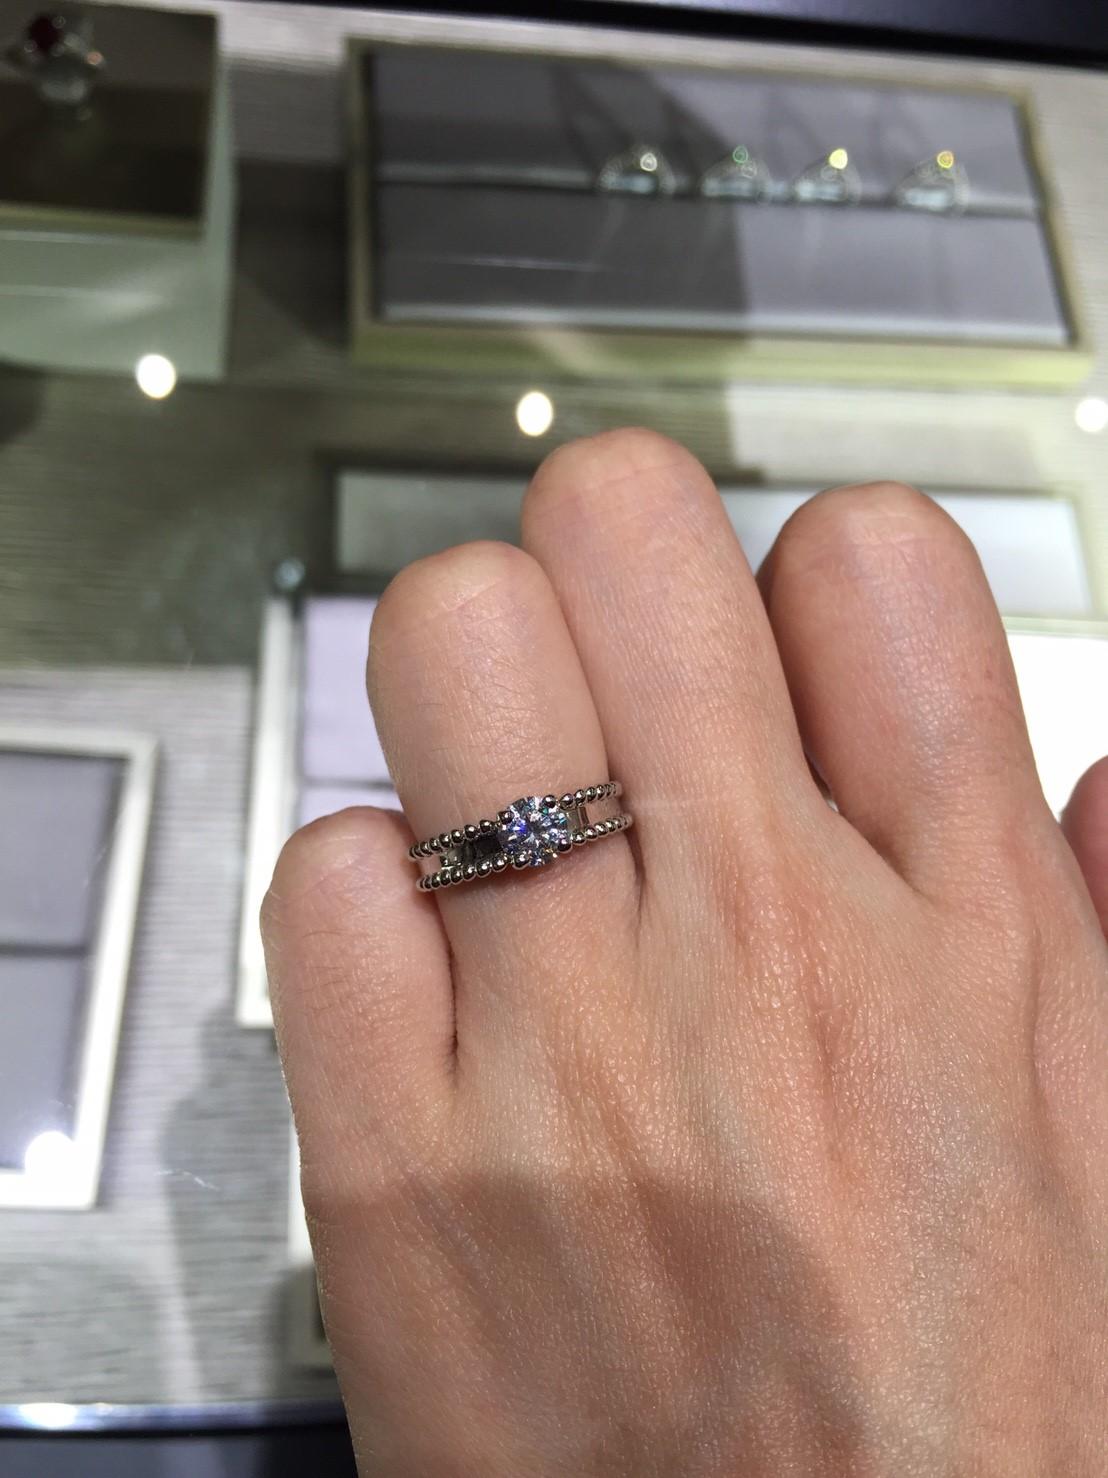 [wedding]鑽戒,婚戒(對戒)挑選Harry Winston,VCA,Chaumet,Cartier,I-primo-選擇篇